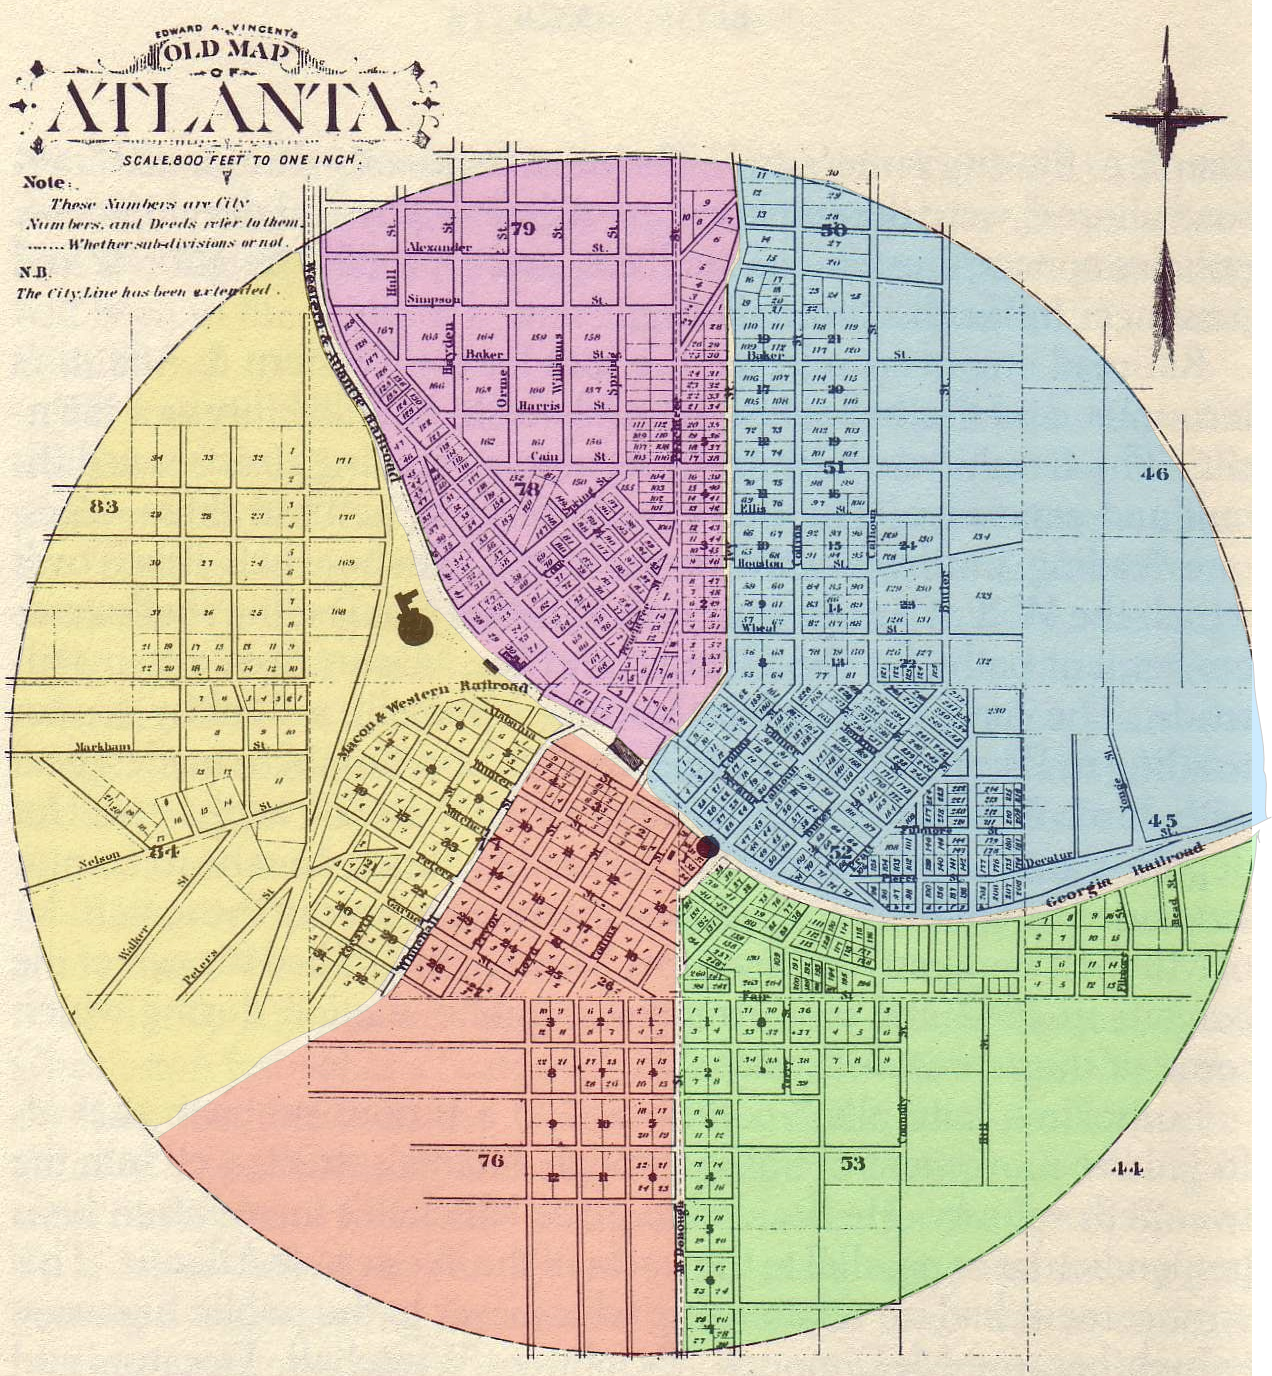 FileAtlantawardpng Wikimedia Commons - Where is atlanta